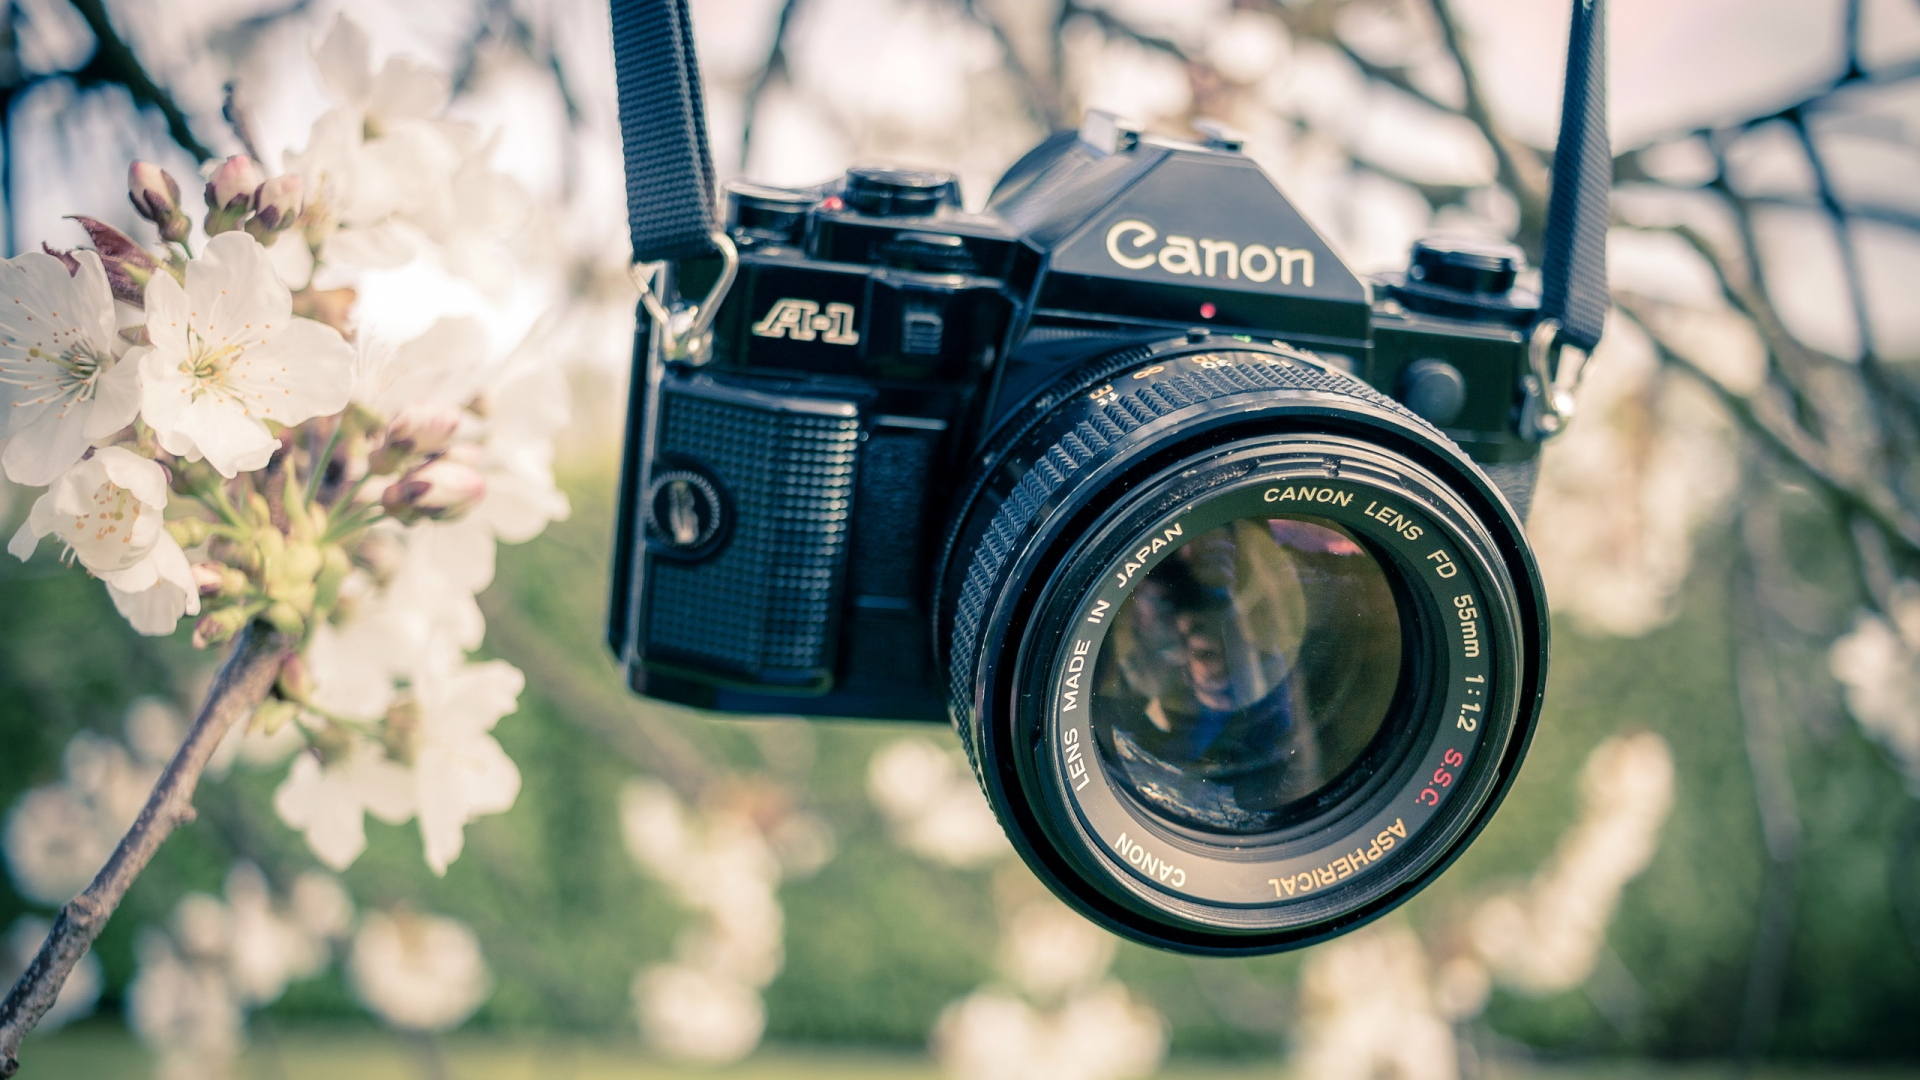 hd hintergrundbilder blumen kamera garten objektiv canon farbe 1920x1080